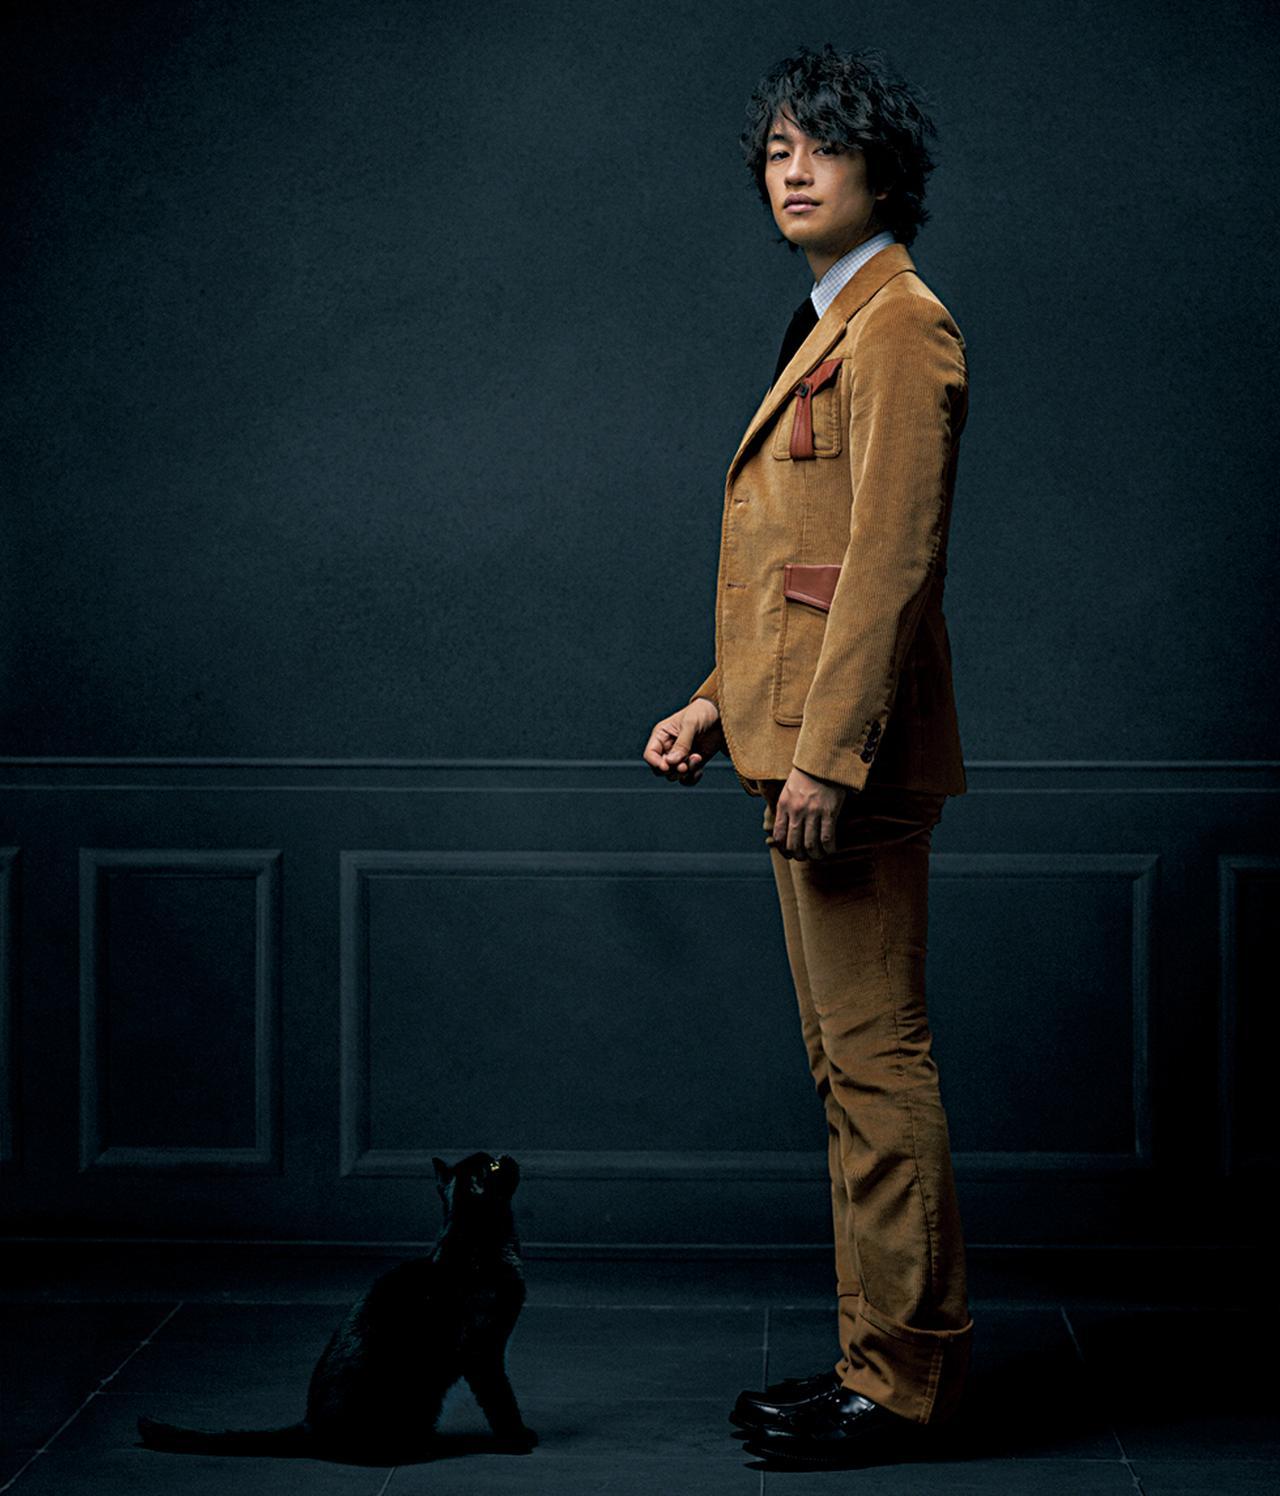 Images : 1番目の画像 - 「斎藤 工、かく纏いし」のアルバム - T JAPAN:The New York Times Style Magazine 公式サイト